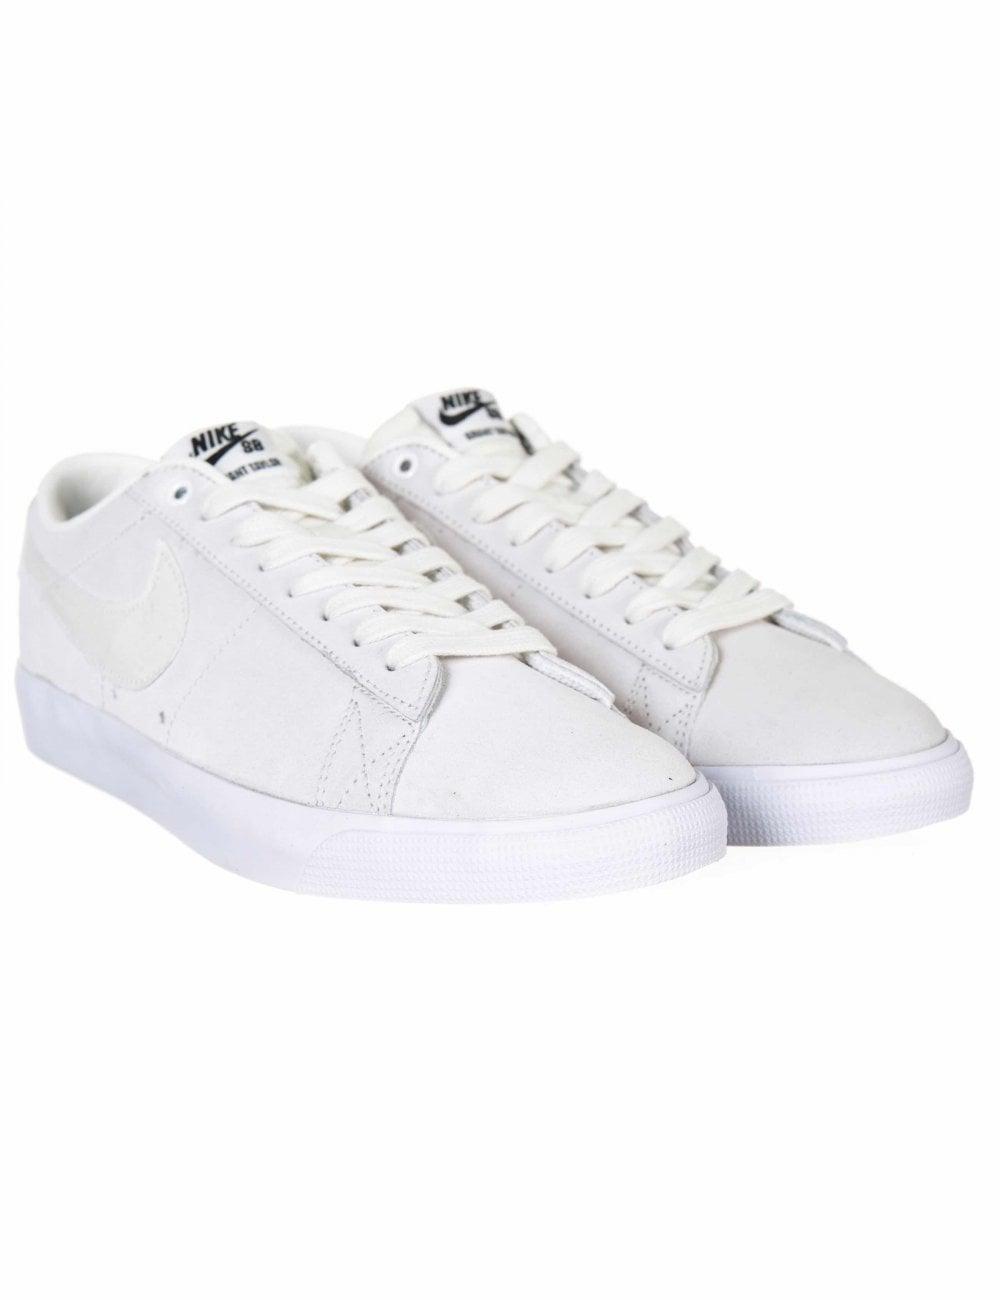 80f1562cb70b Nike SB Zoom Blazer Low GT Shoes - Summit White - Footwear from Fat ...